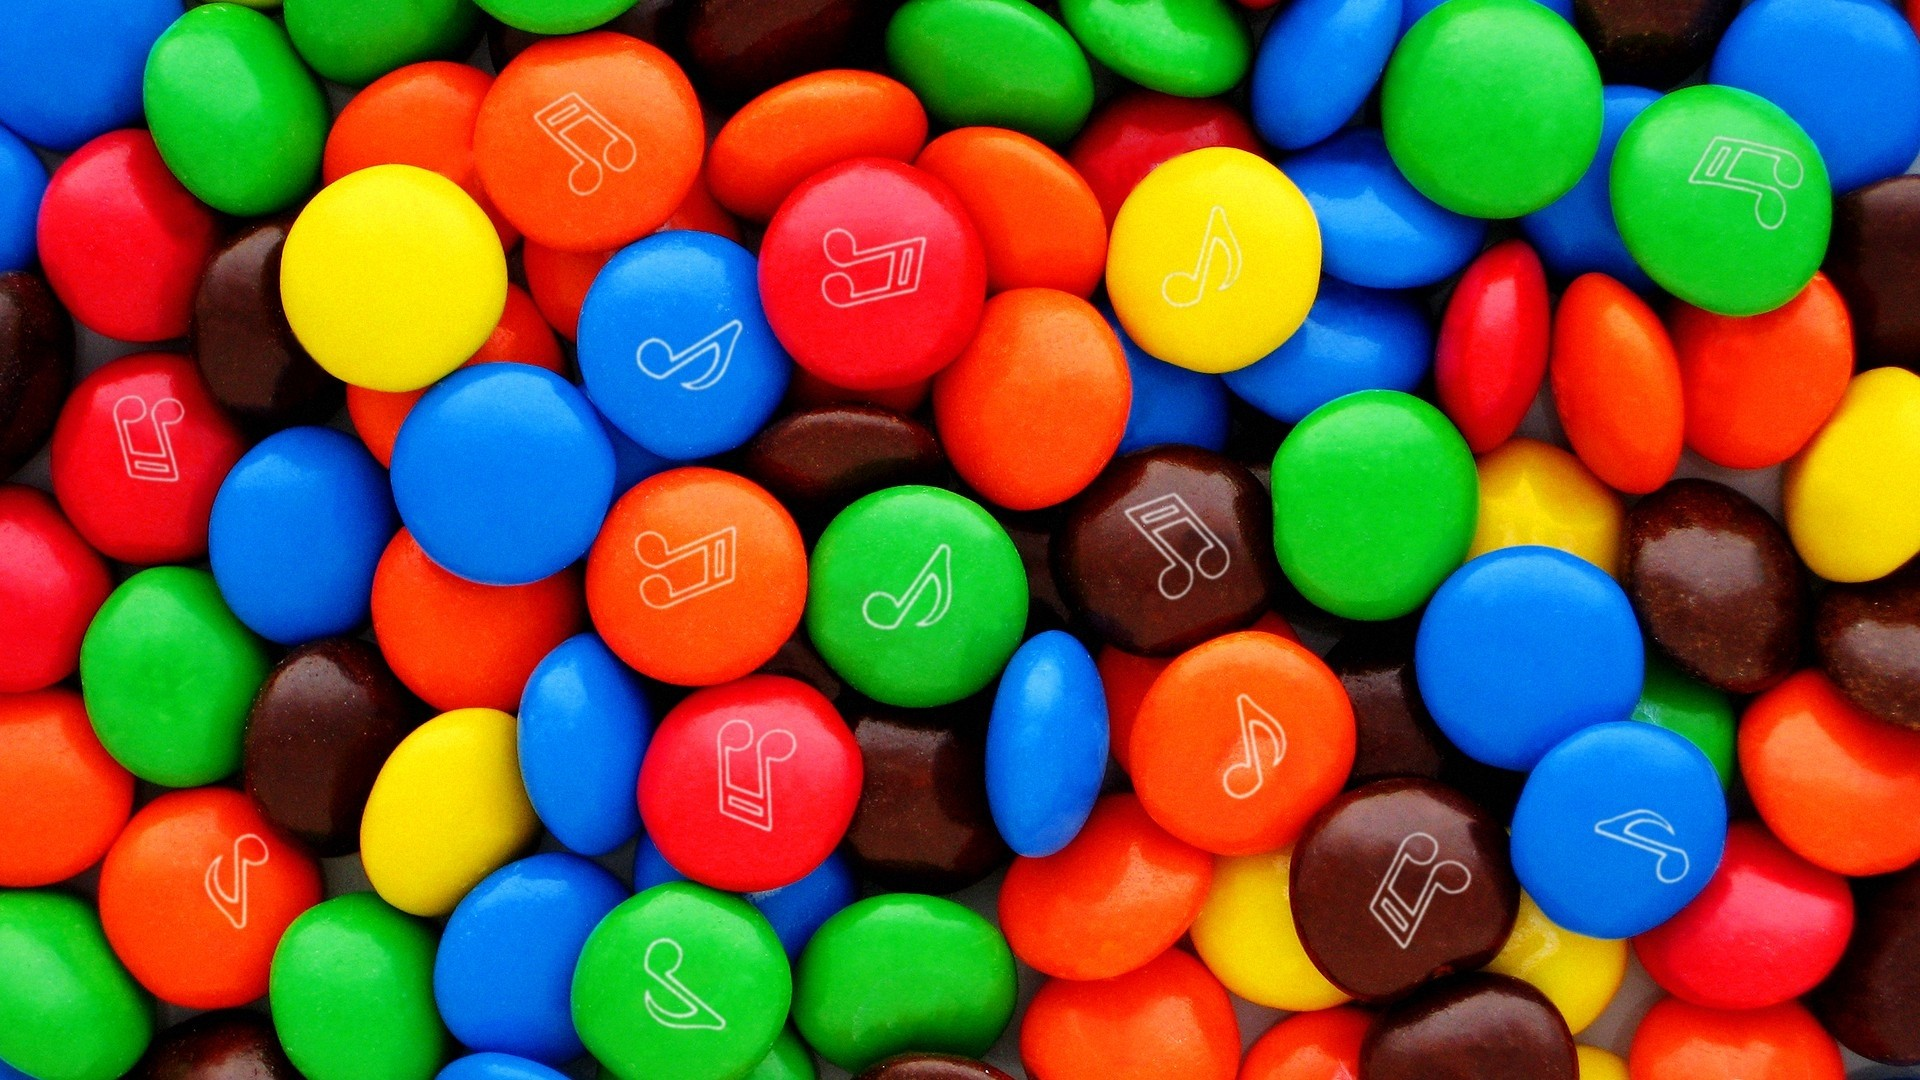 Skittles good wallpaper hd